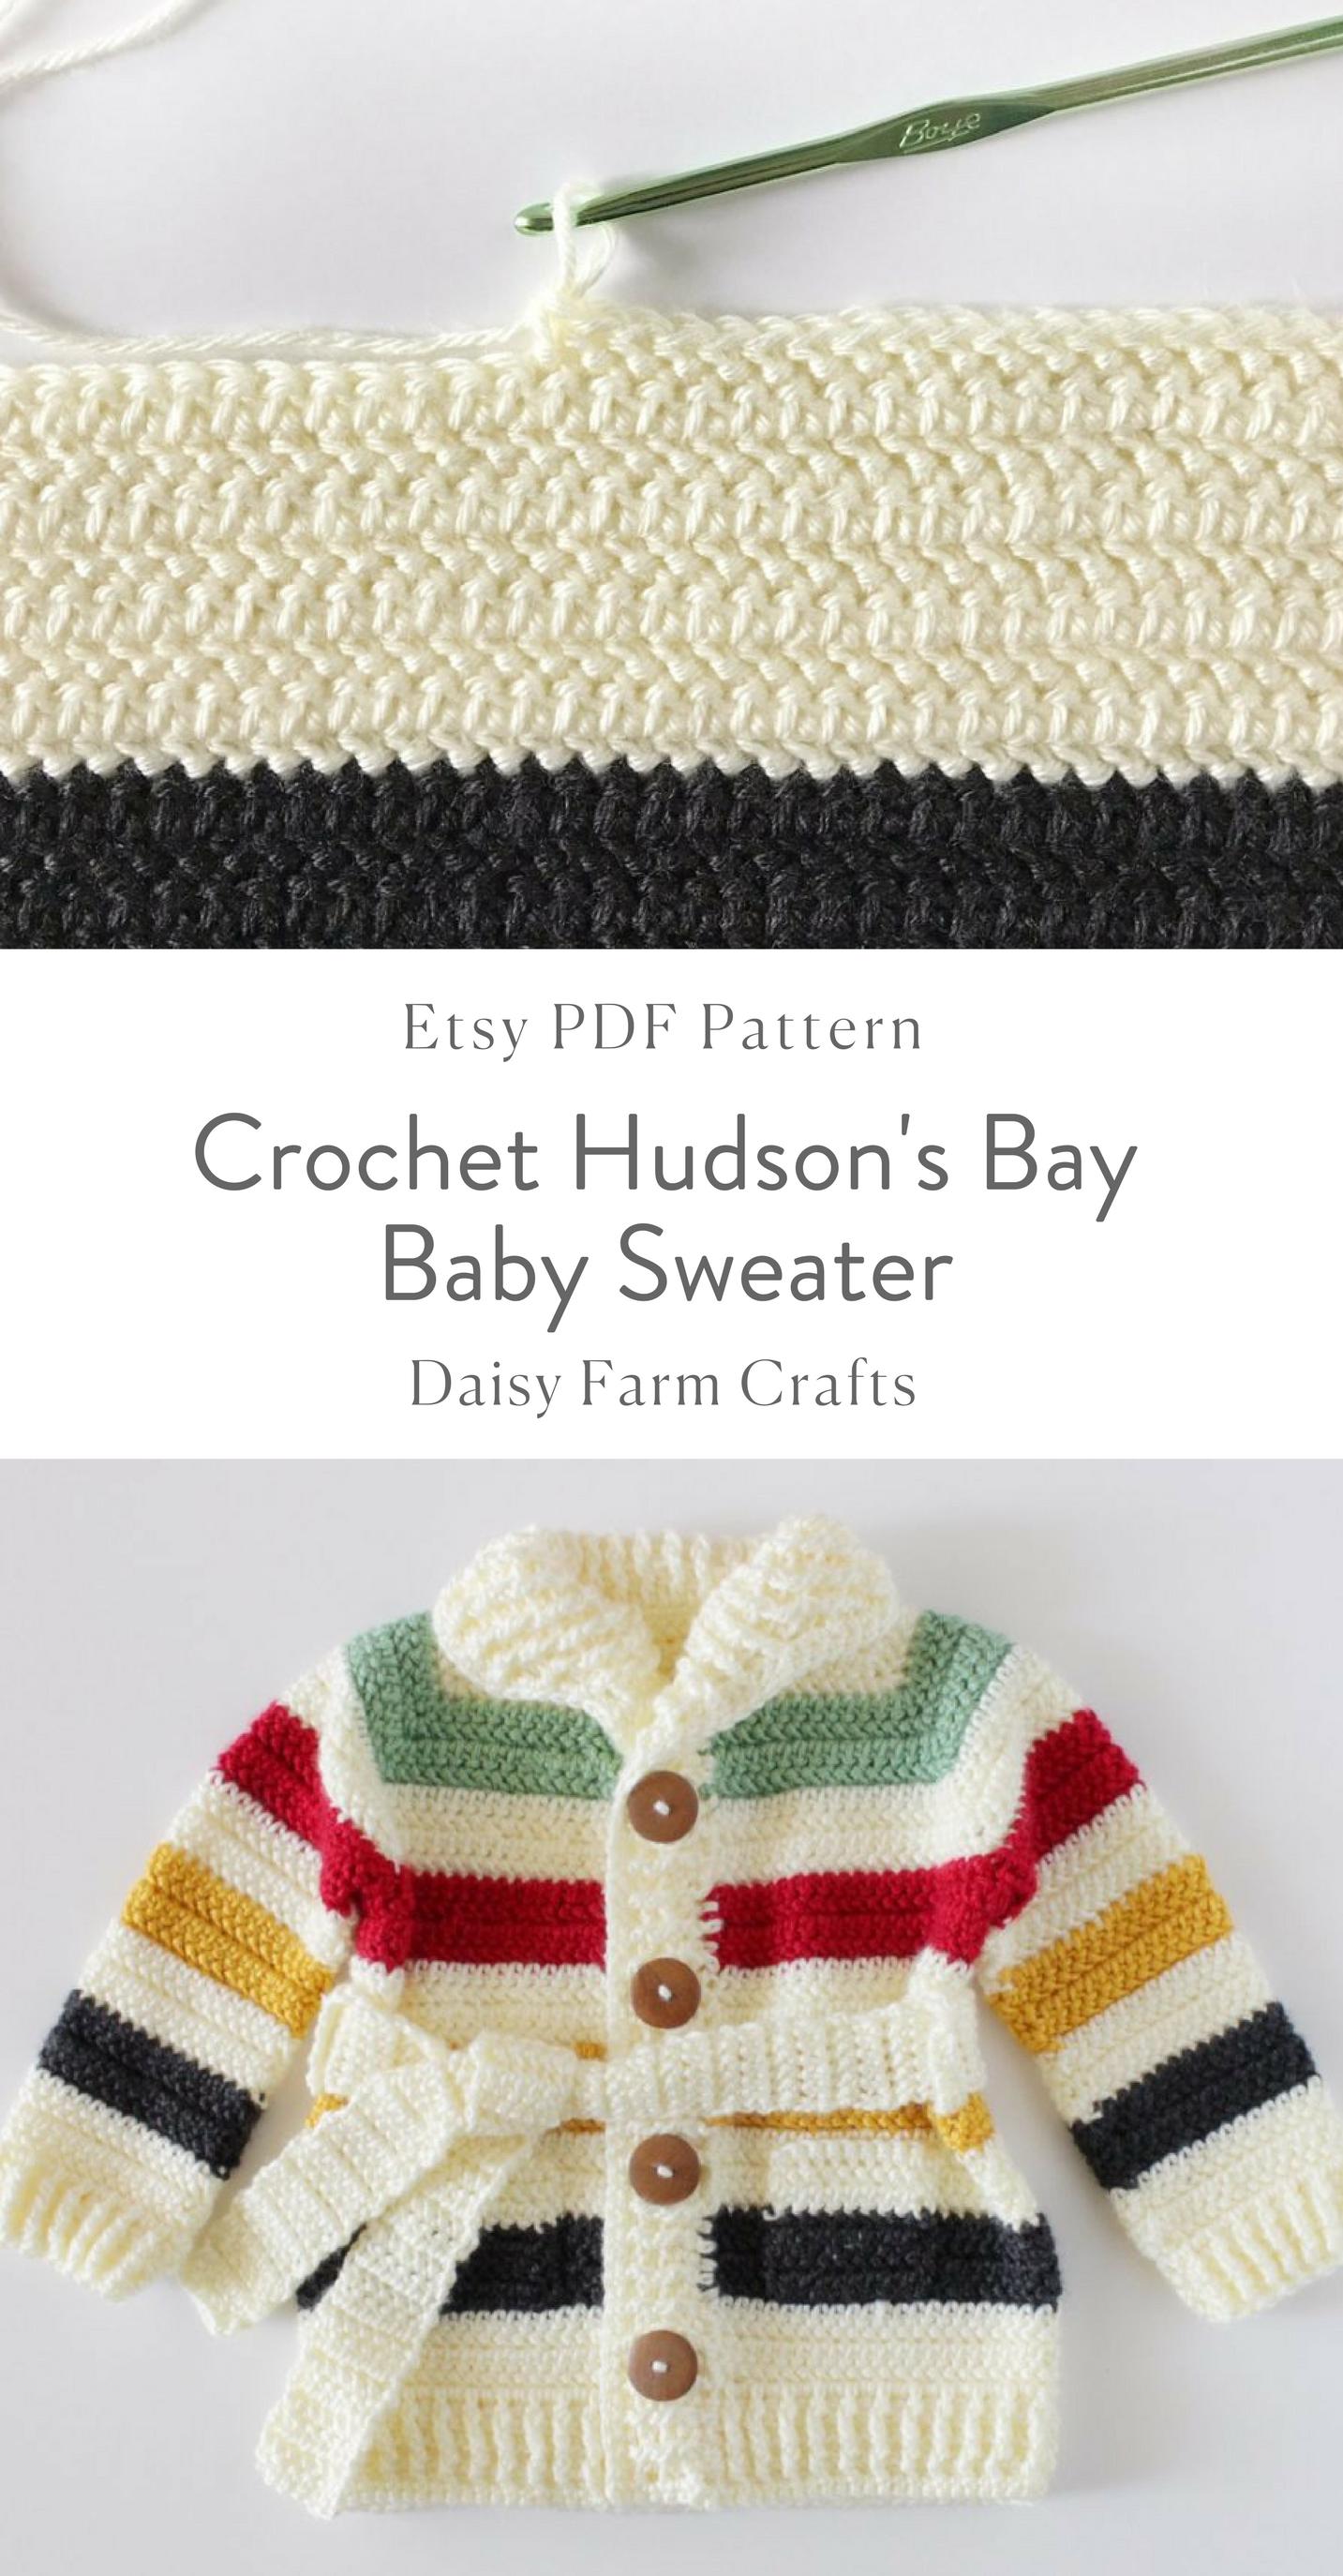 ae3995878b81 Etsy PDF Pattern - Crochet Hudson s Bay Baby Sweater